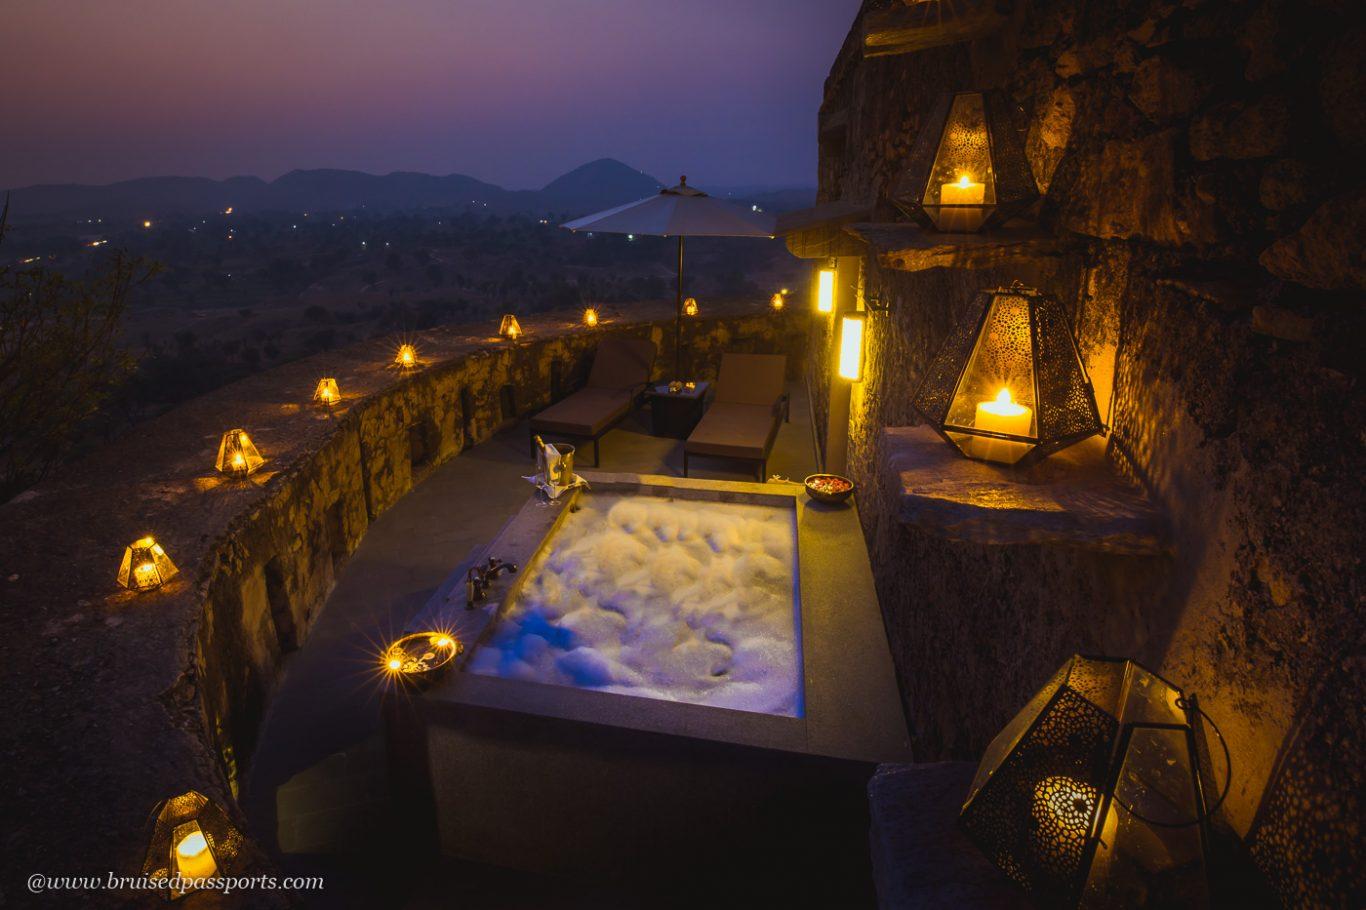 Private bath tub overlooking the Aravallia at Alila Fort Bishangarh